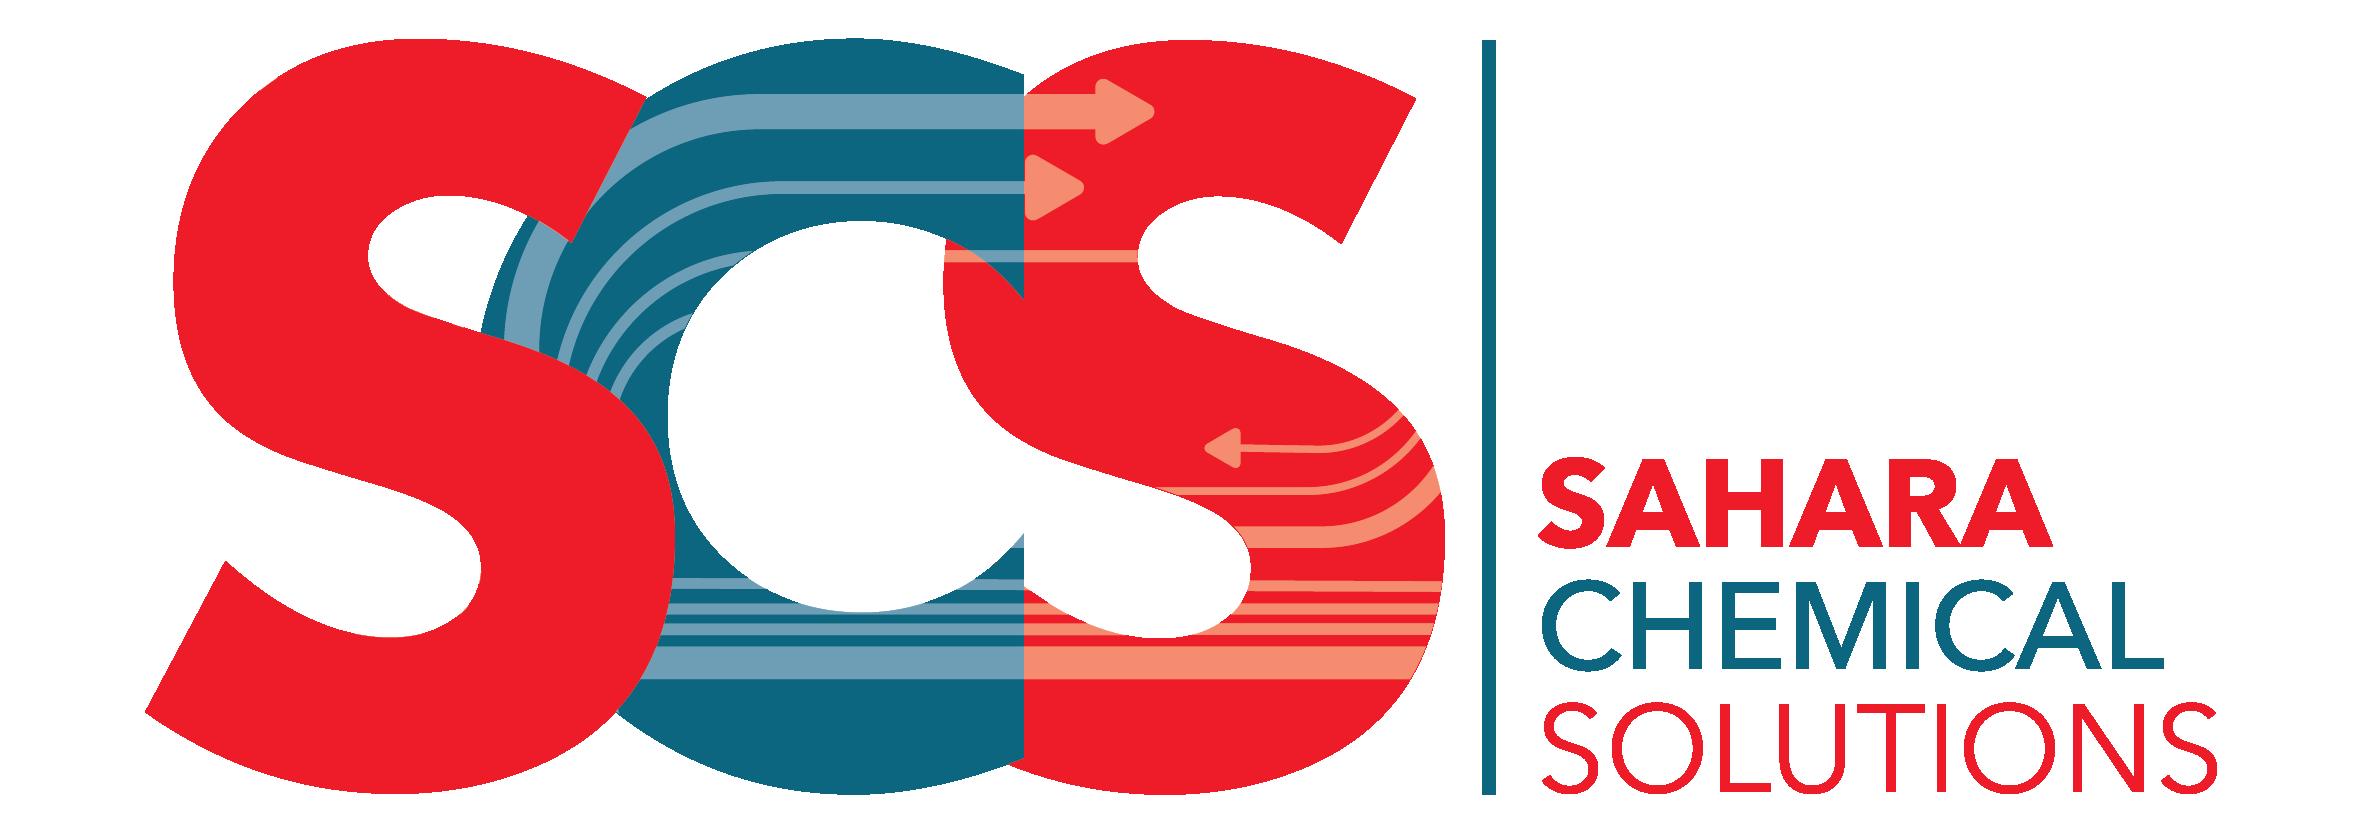 Sahara Chemical Solutions